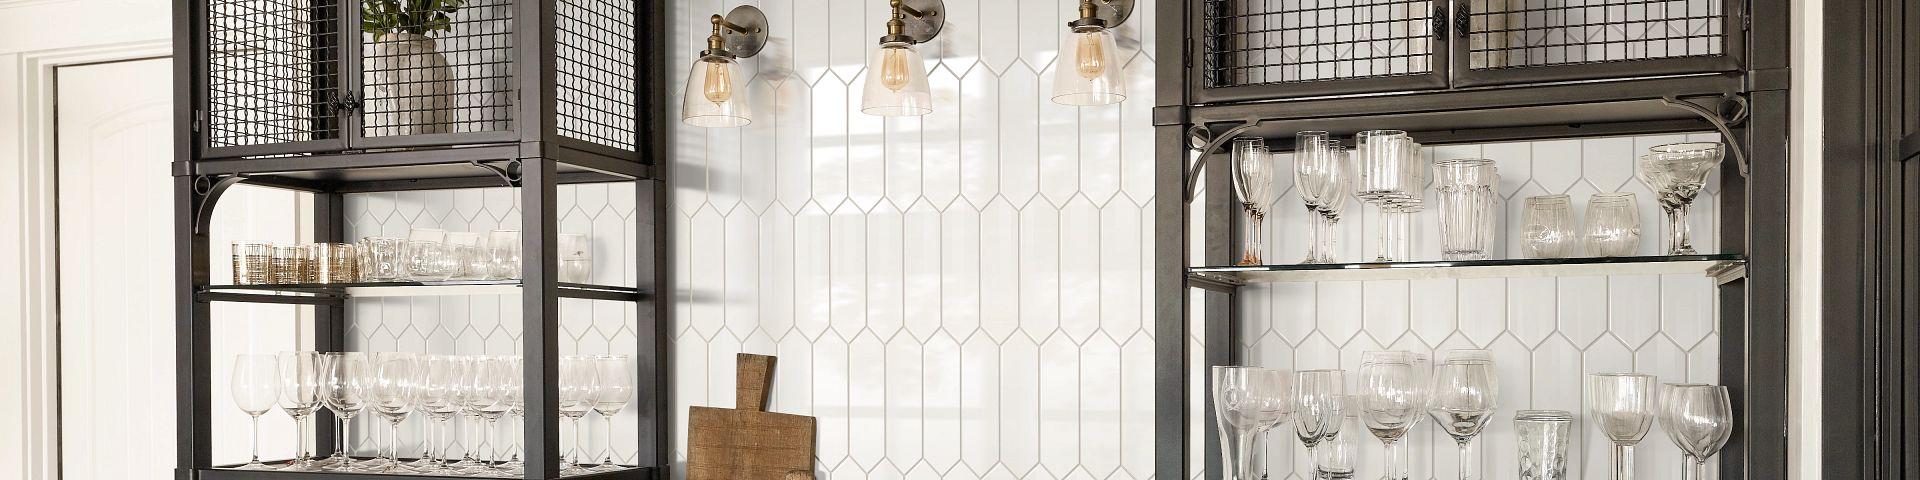 Tile-and-Stone-Backsplash-Cutlass-365TS-00100-WhitePicket-3x12-Gloss-Kitchen-2020